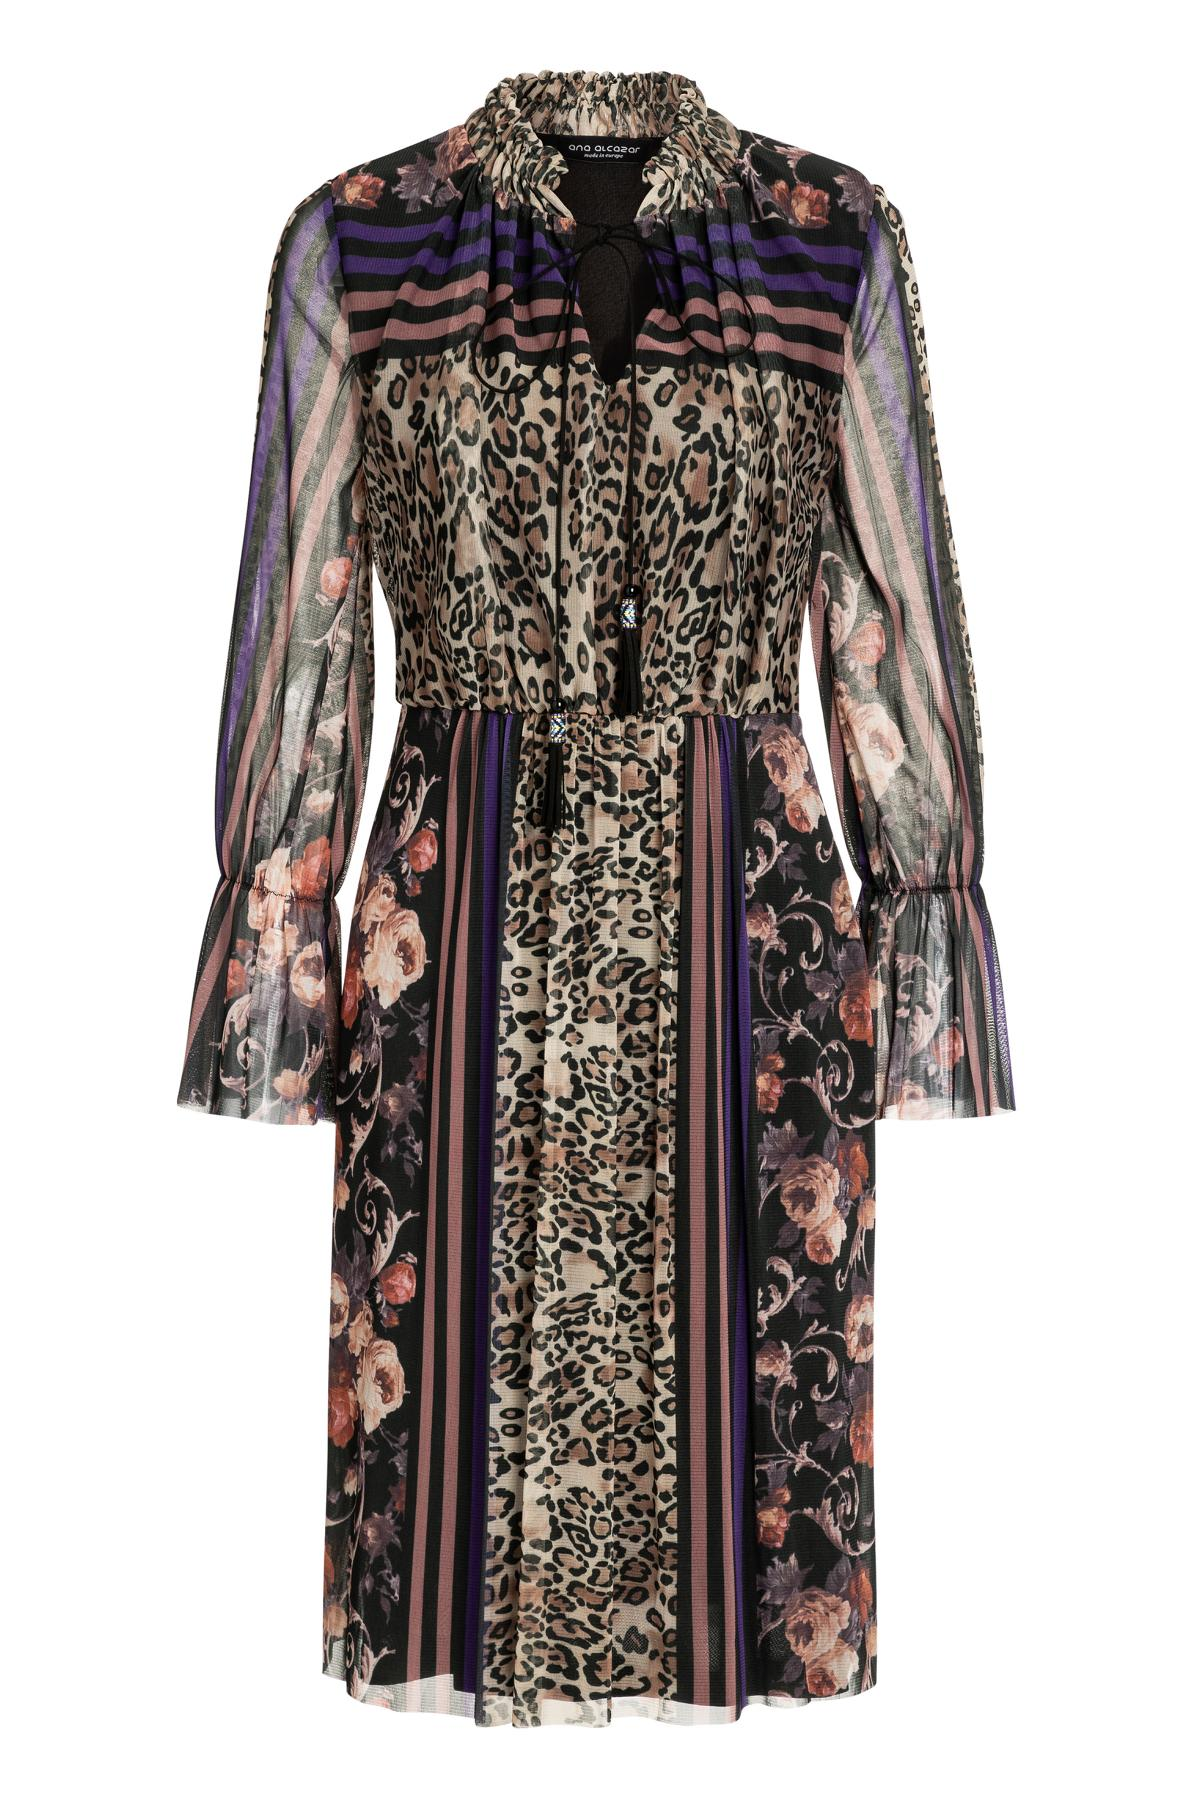 Ana Alcazar Romantik Kleid Vormaly